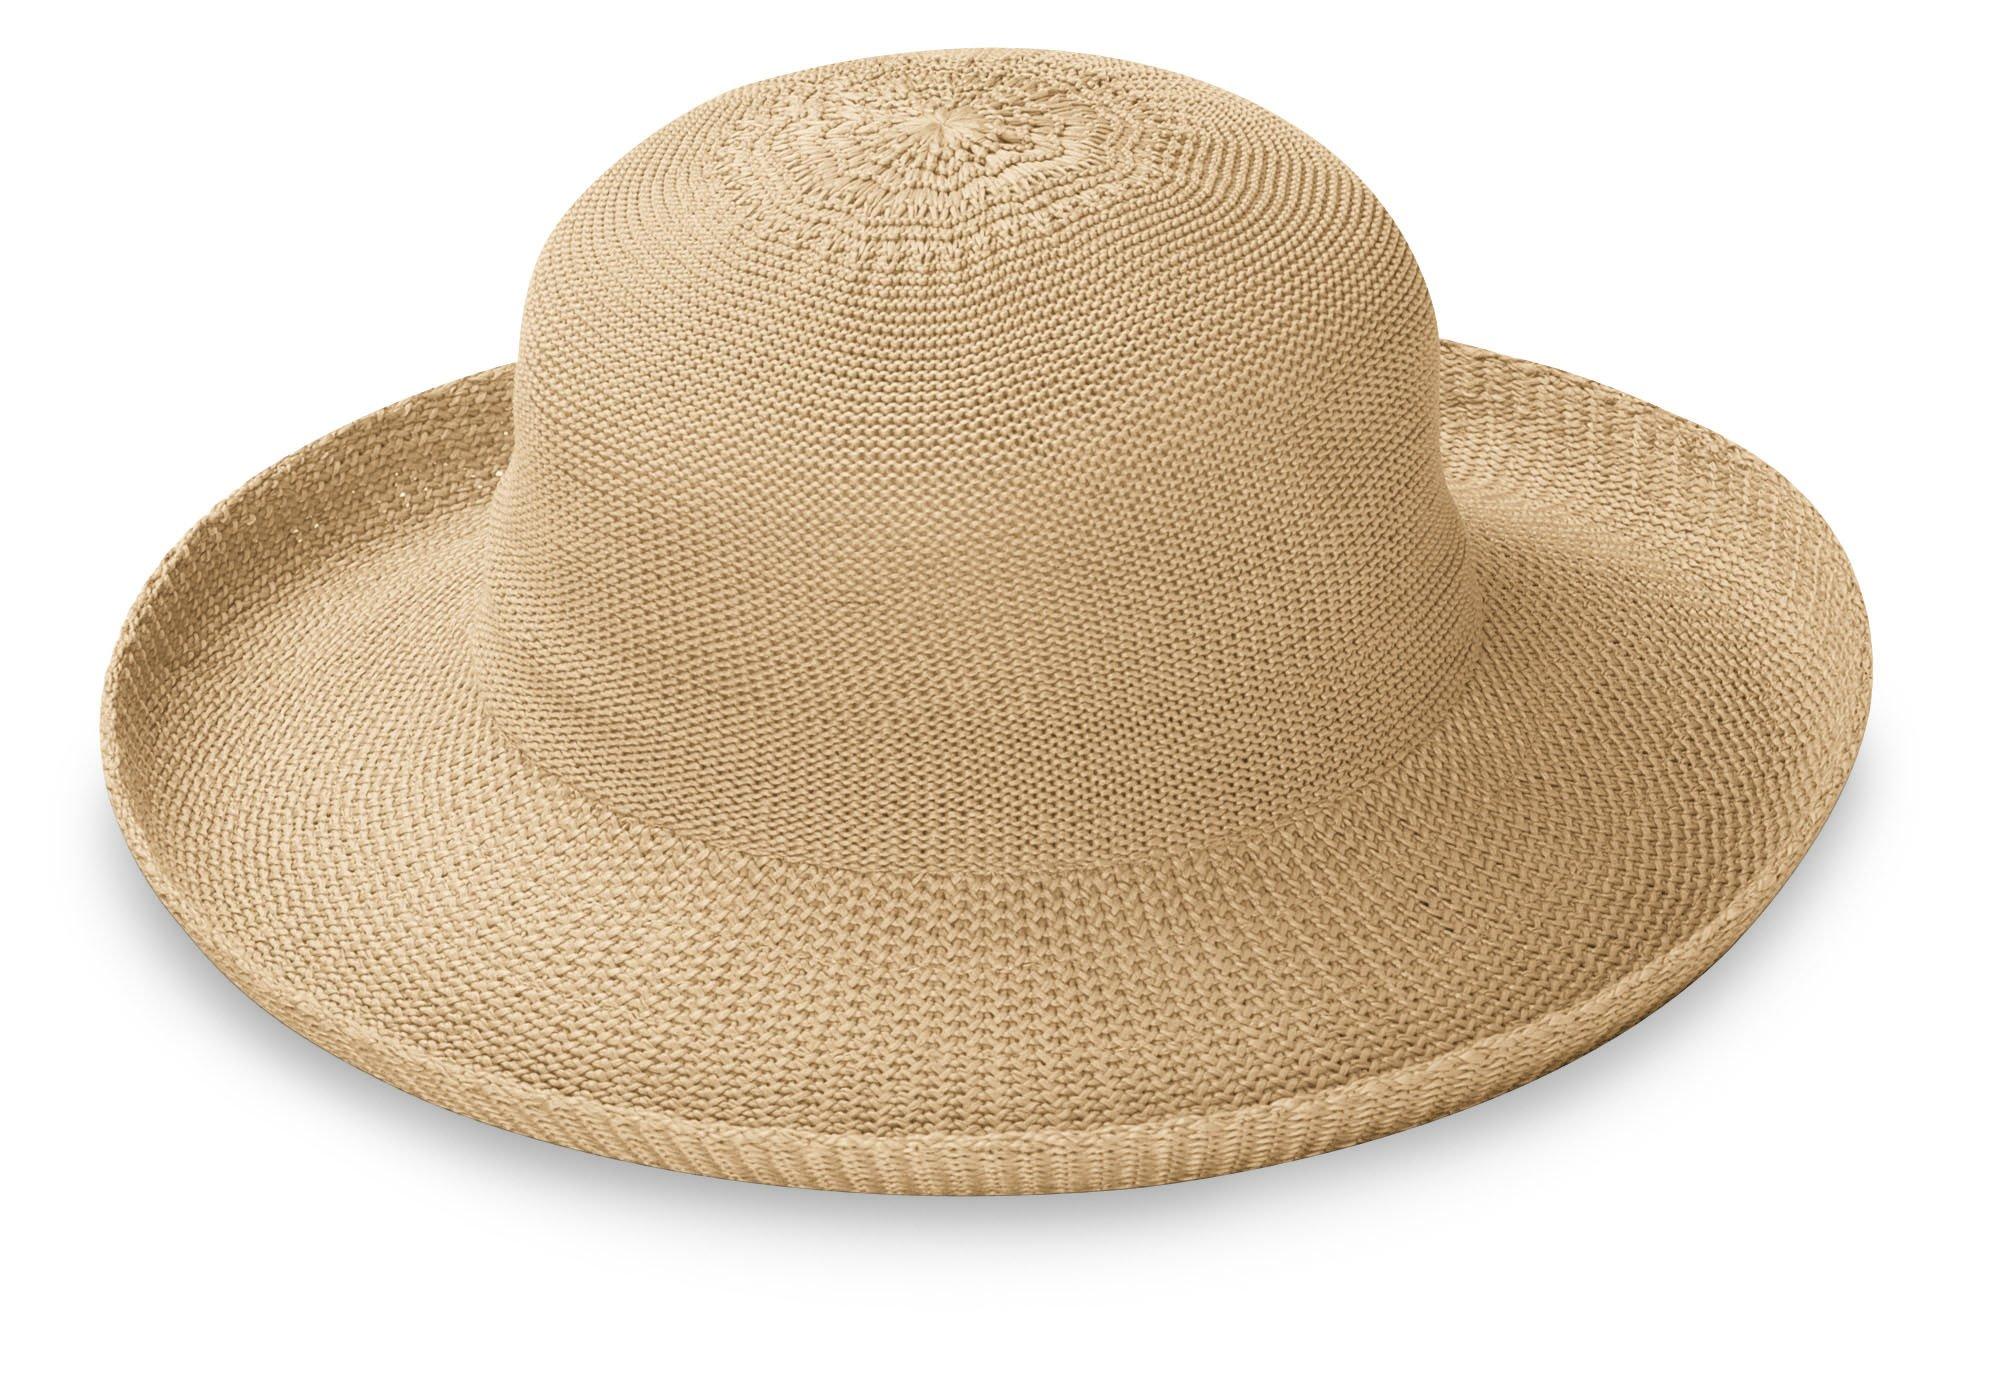 Wallaroo Hat Company Women's Petite Victoria Sun Hat - Tan - Packable, Modern Style, Petite Size, Designed in Australia. by Wallaroo Hat Company